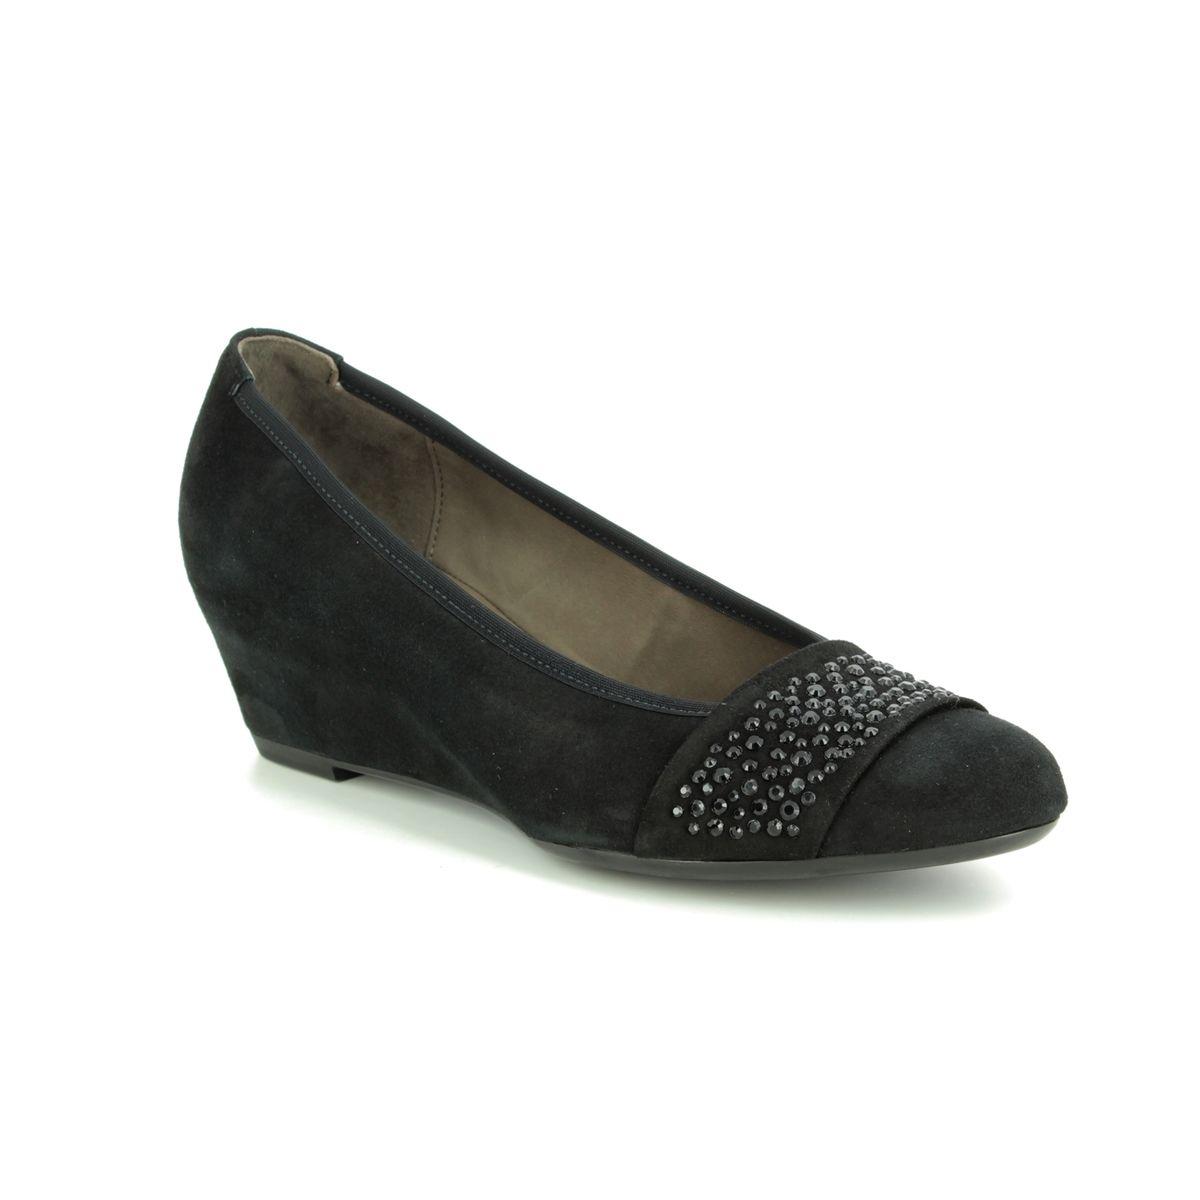 ee6711bc92e Gabor Wedge Shoes - Black nubuck - 25.369.17 FODDER